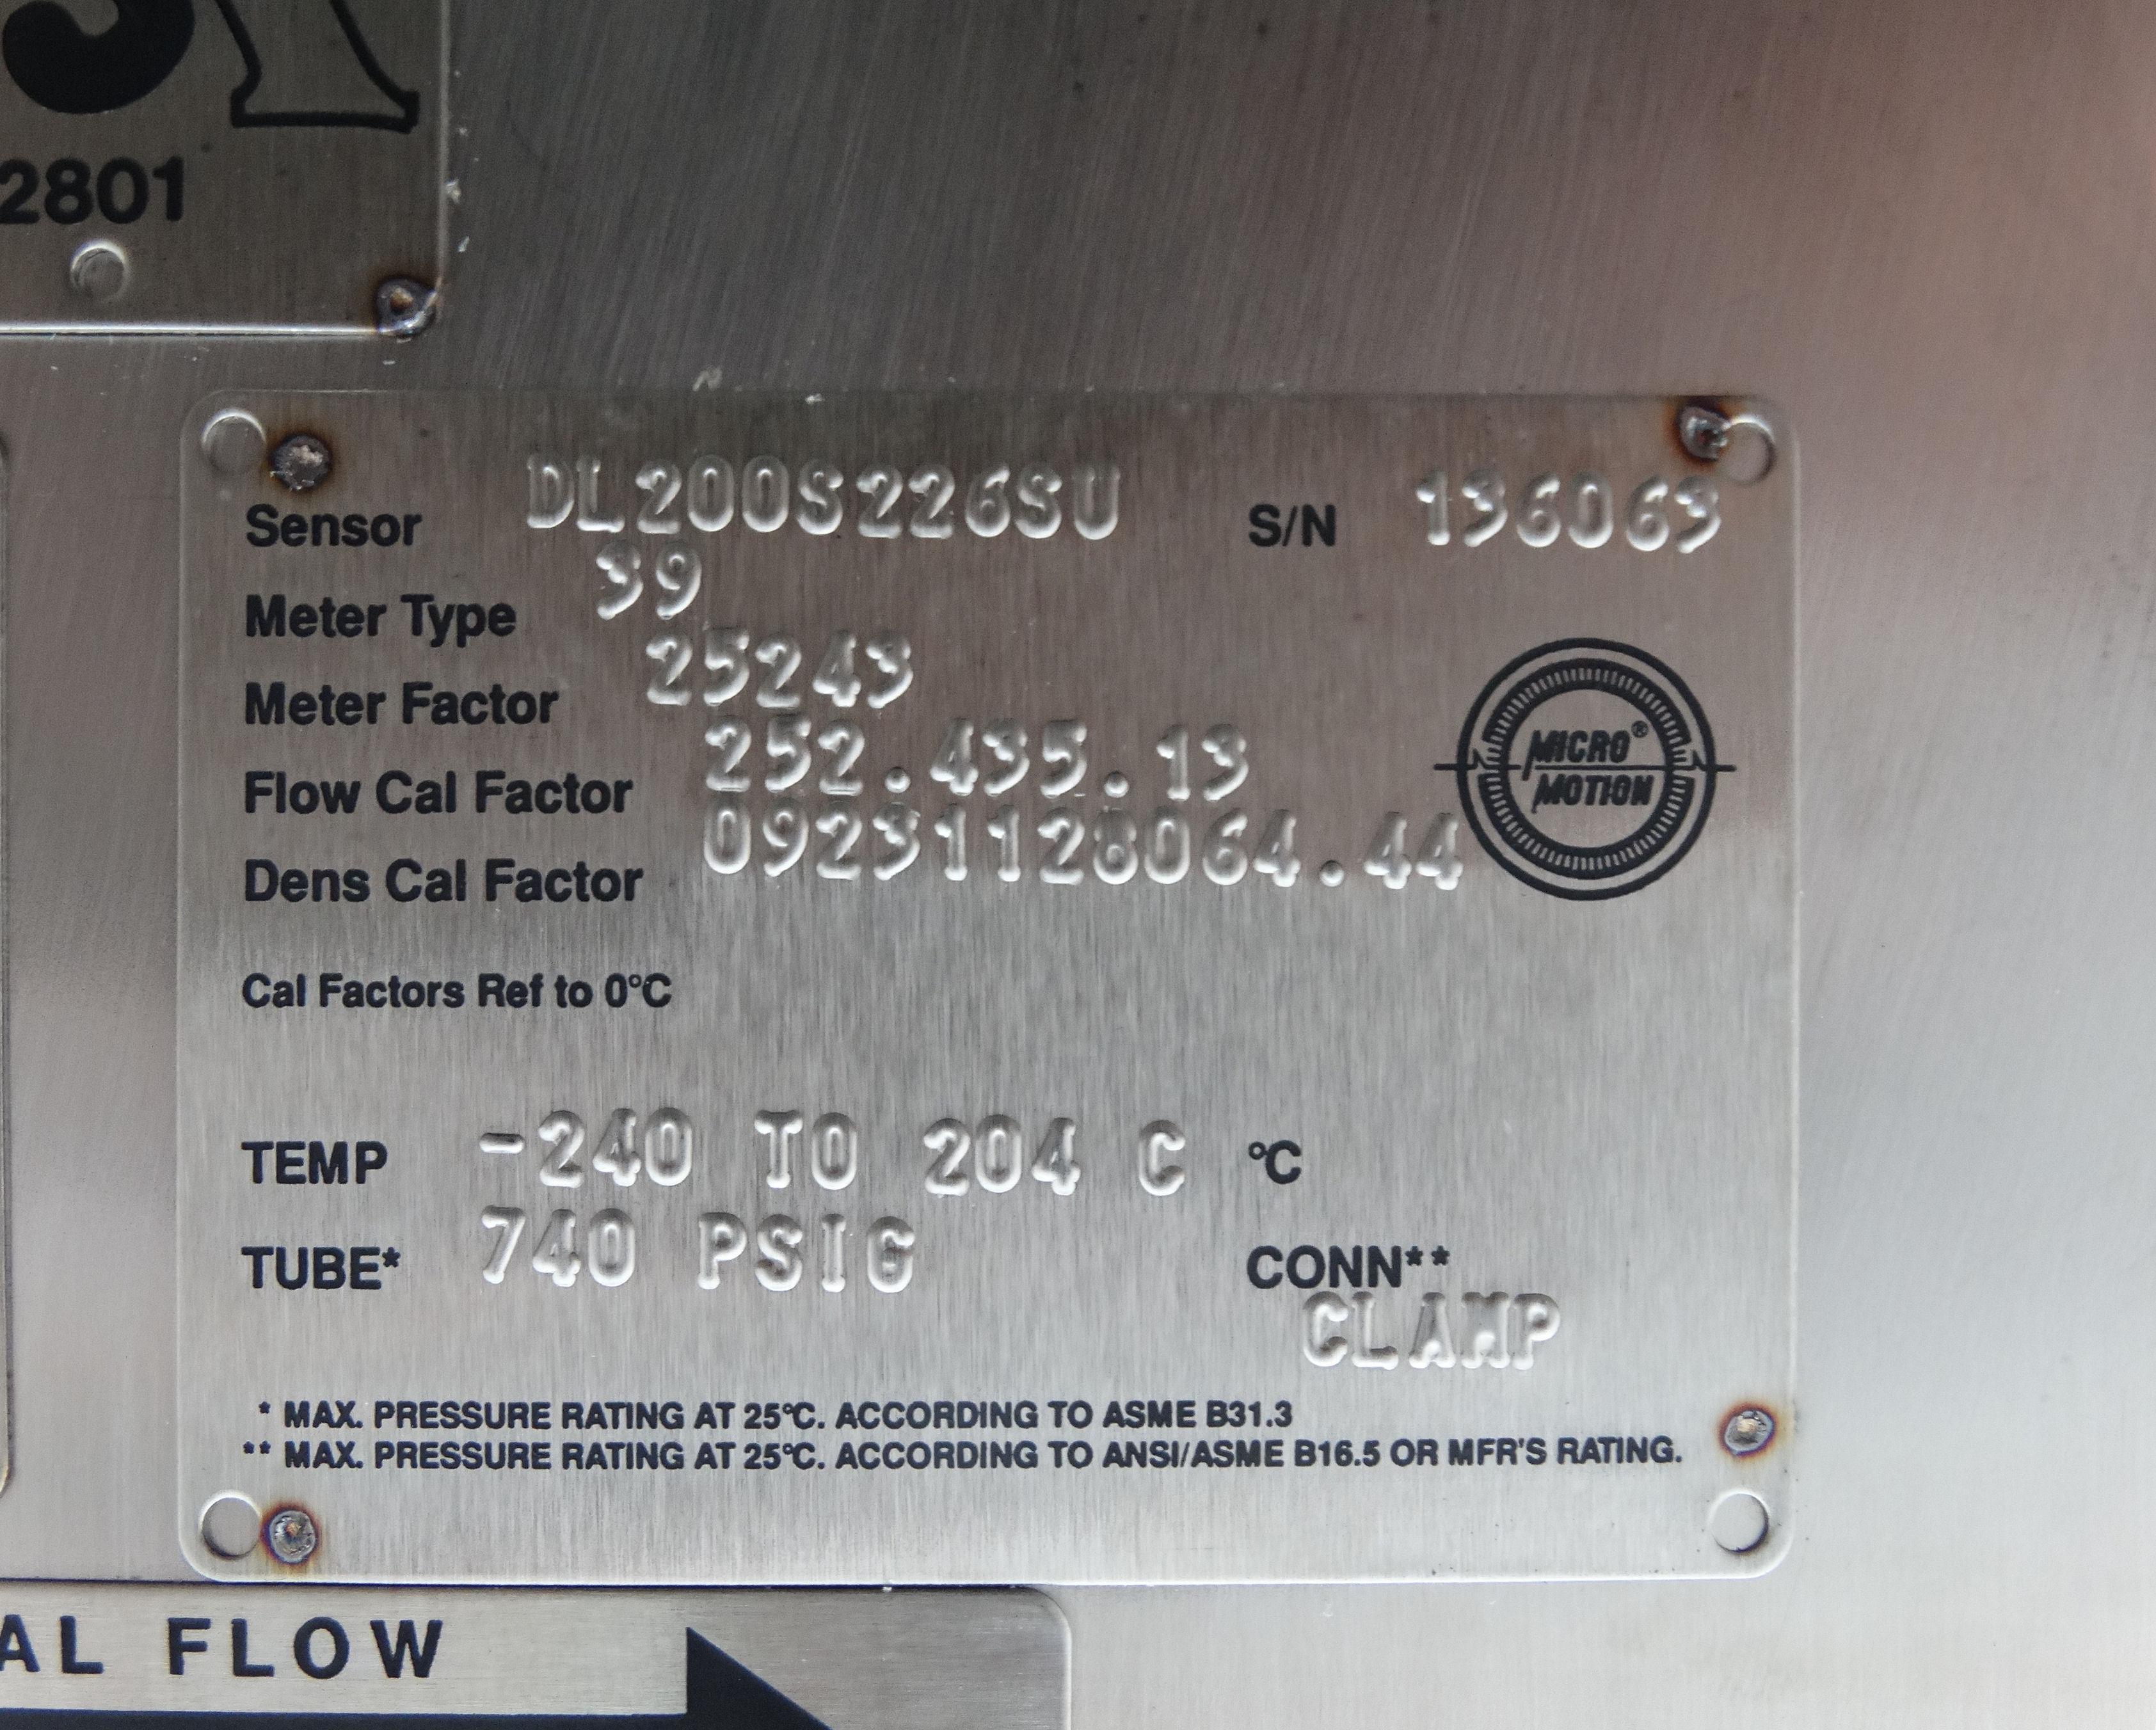 Micro Motion DL200S226SU Mass Flow Sensor D1533 - Image 4 of 5